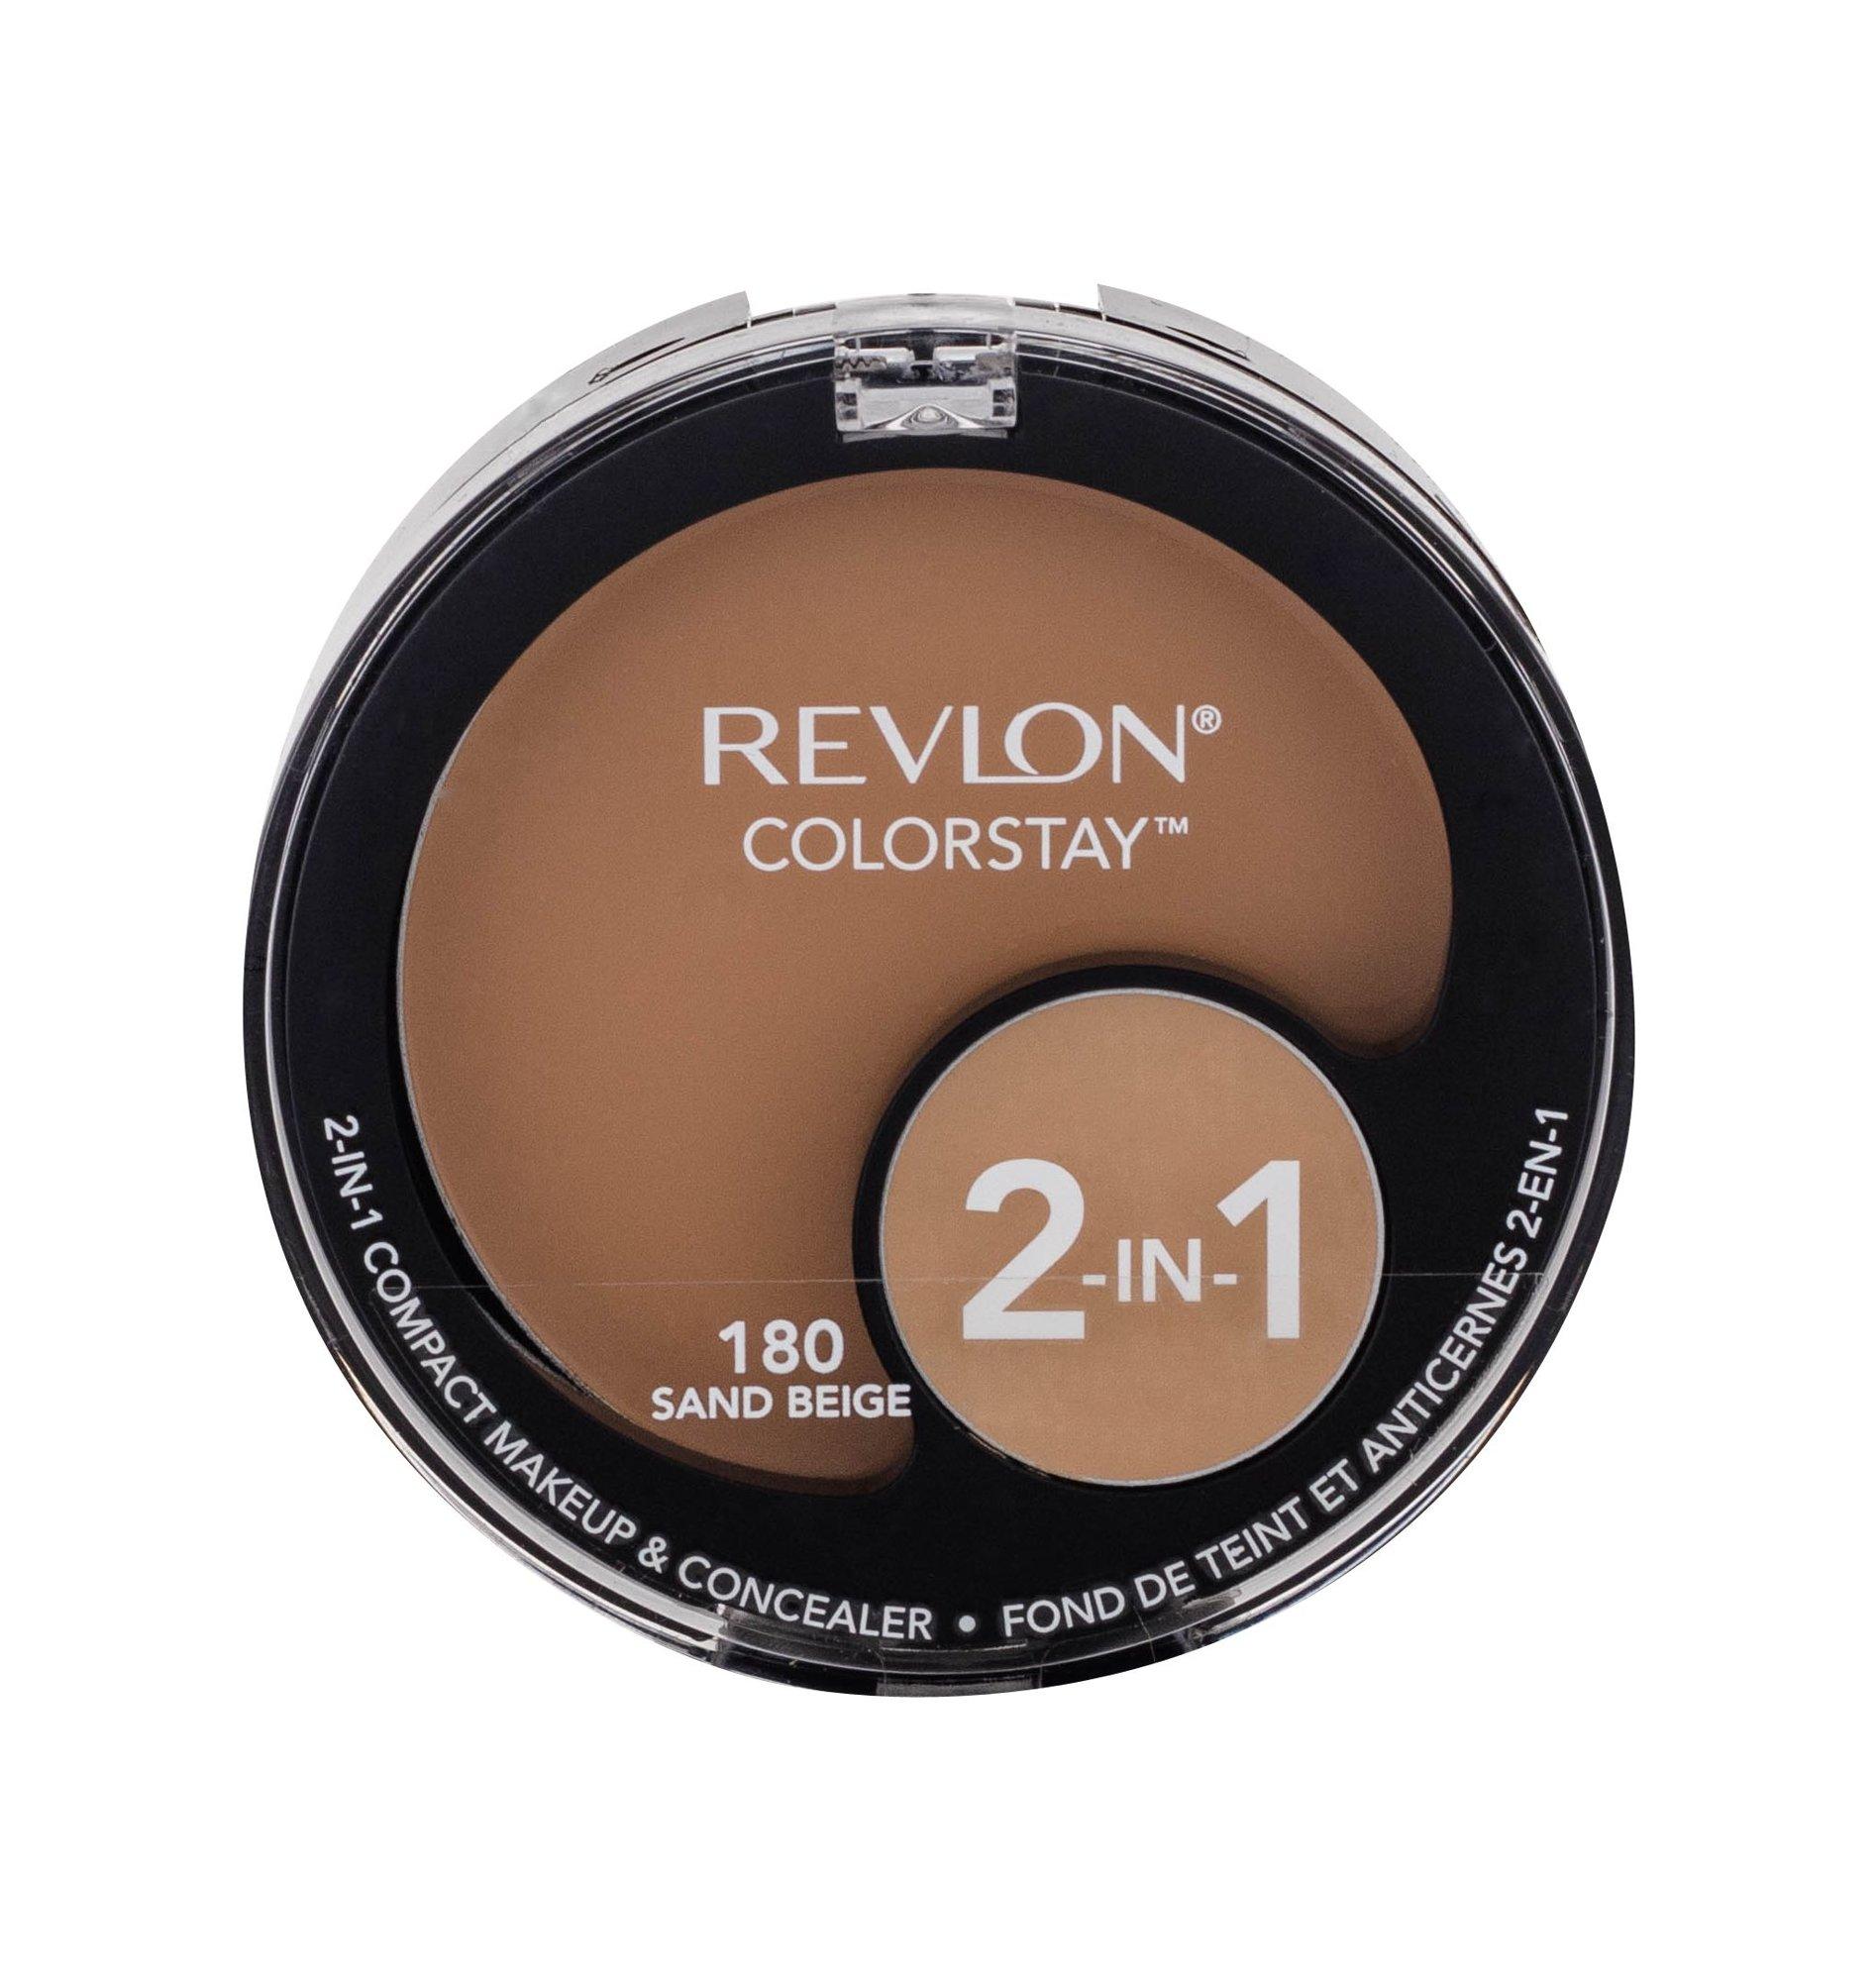 Revlon Colorstay Makeup 12,3ml 180 Sand Beige